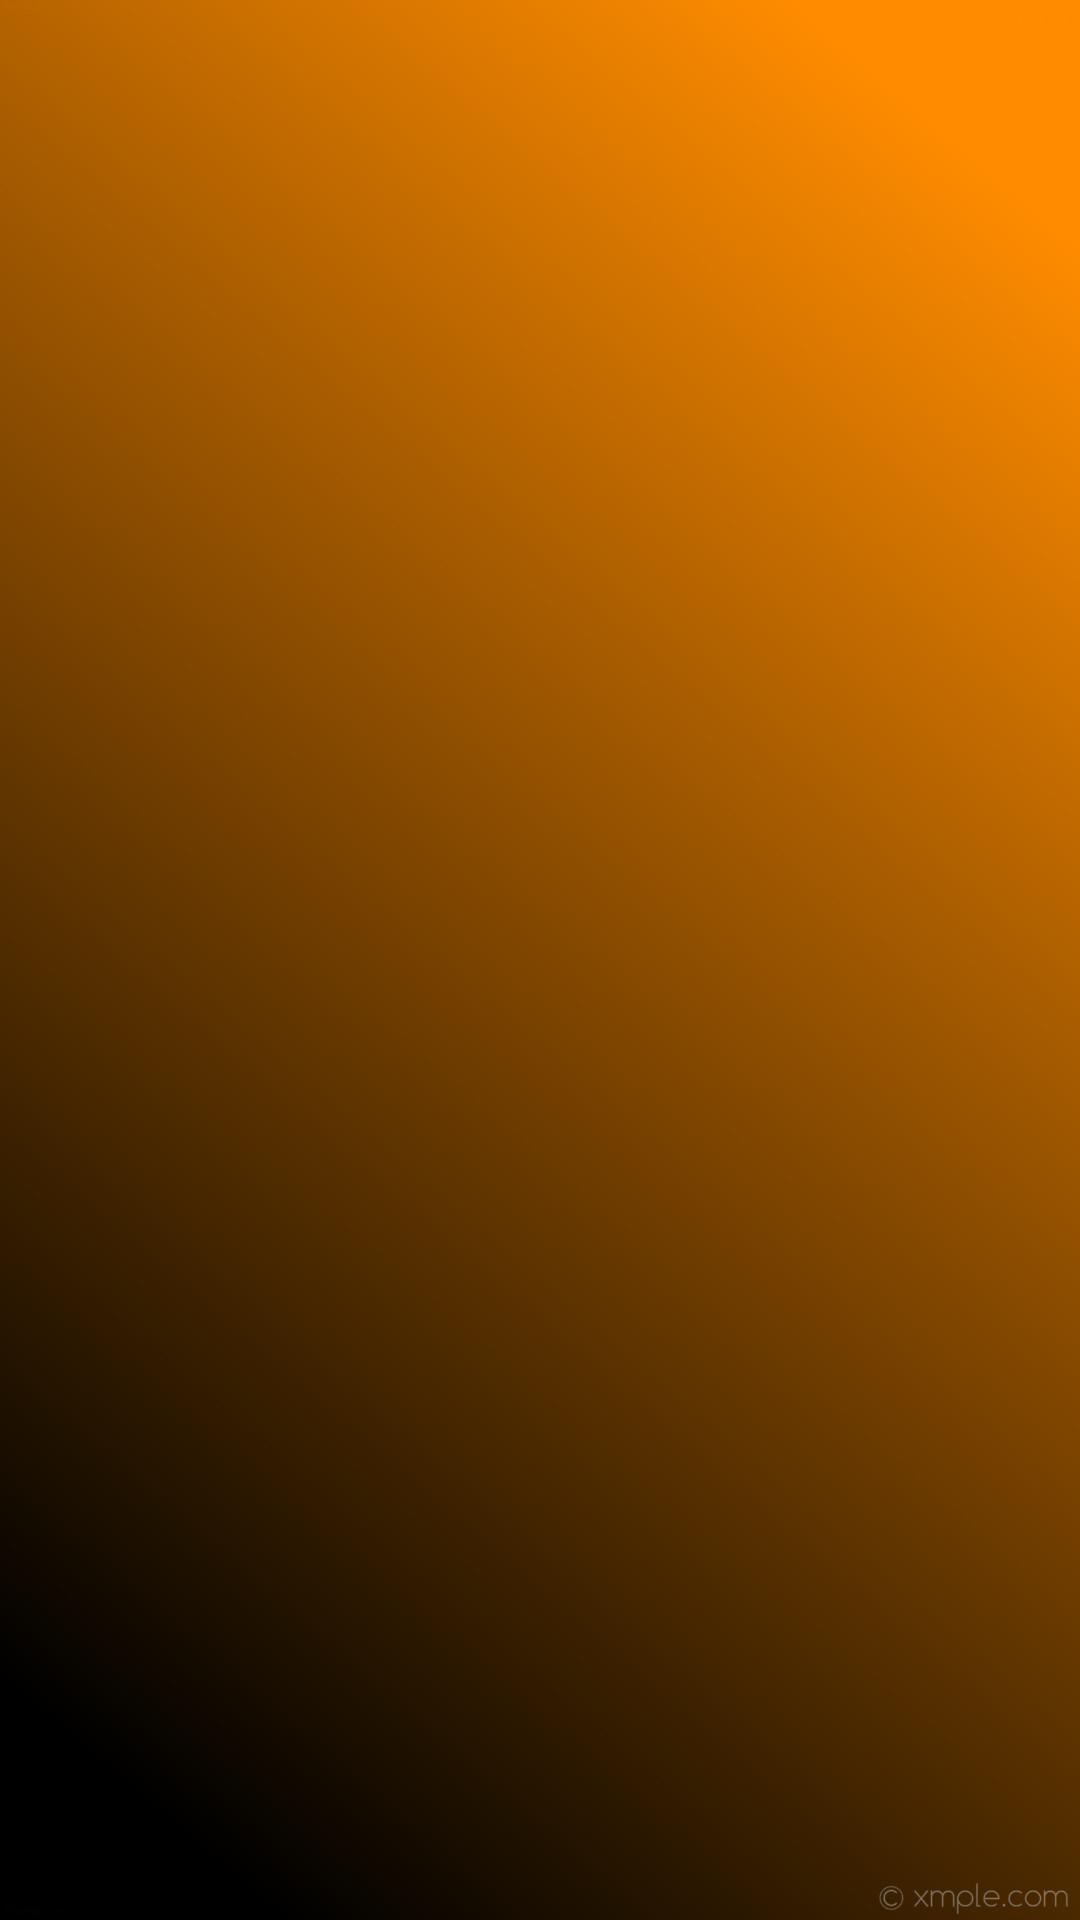 wallpaper gradient orange black linear dark orange #000000 #ff8c00 255°